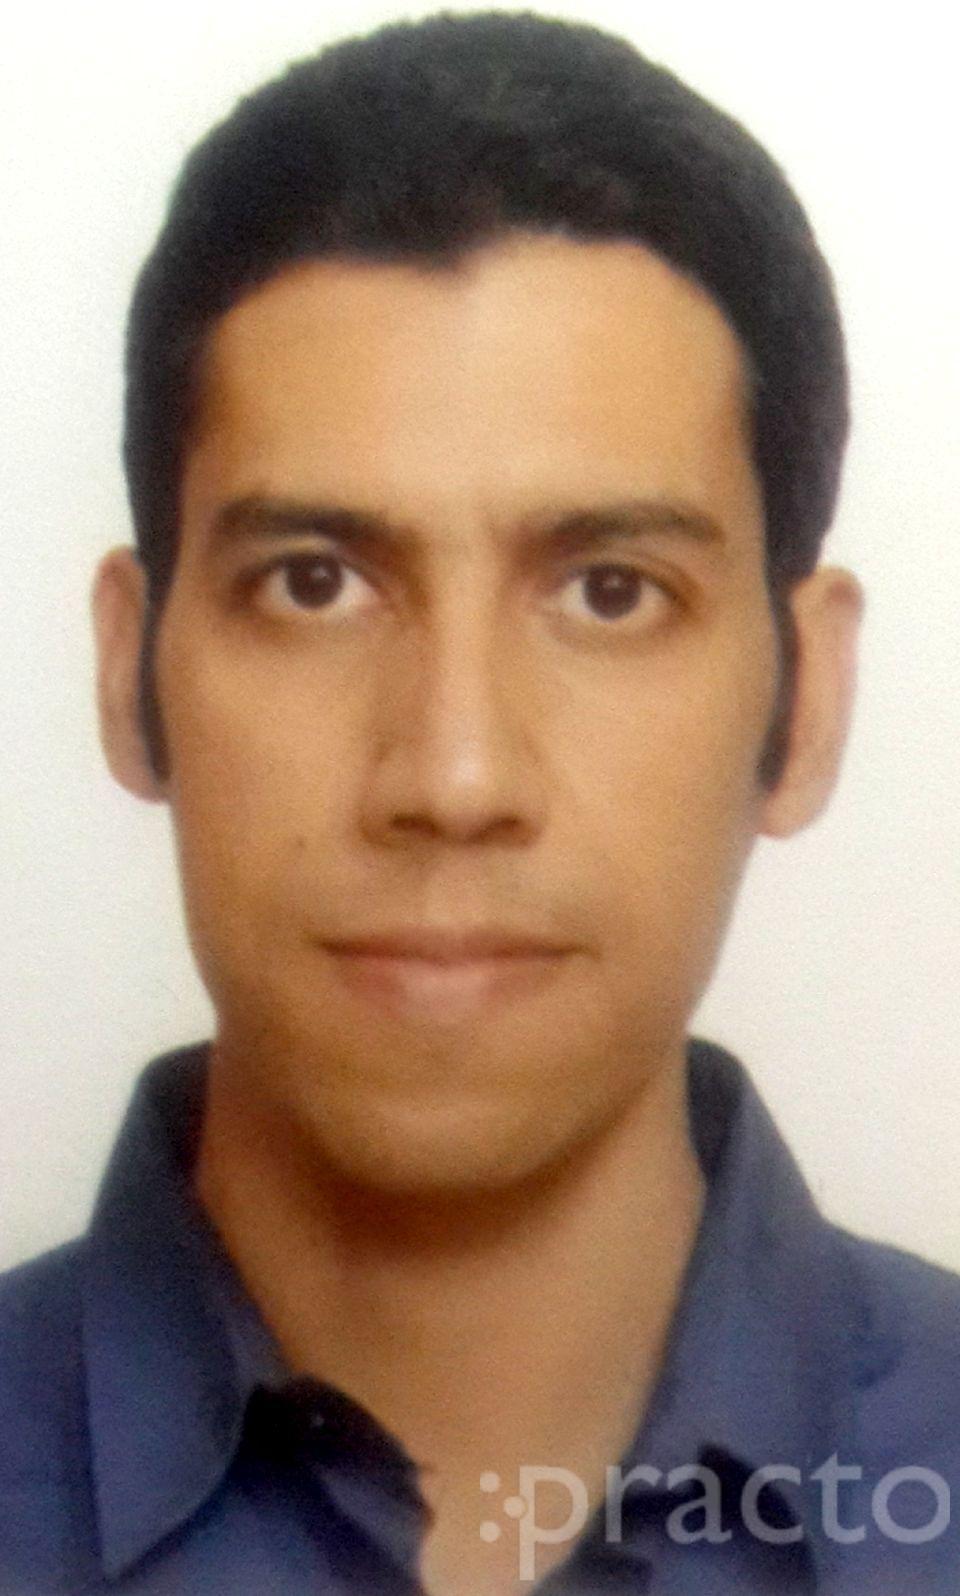 Dr. Sanchit Talwar - Dermatologist